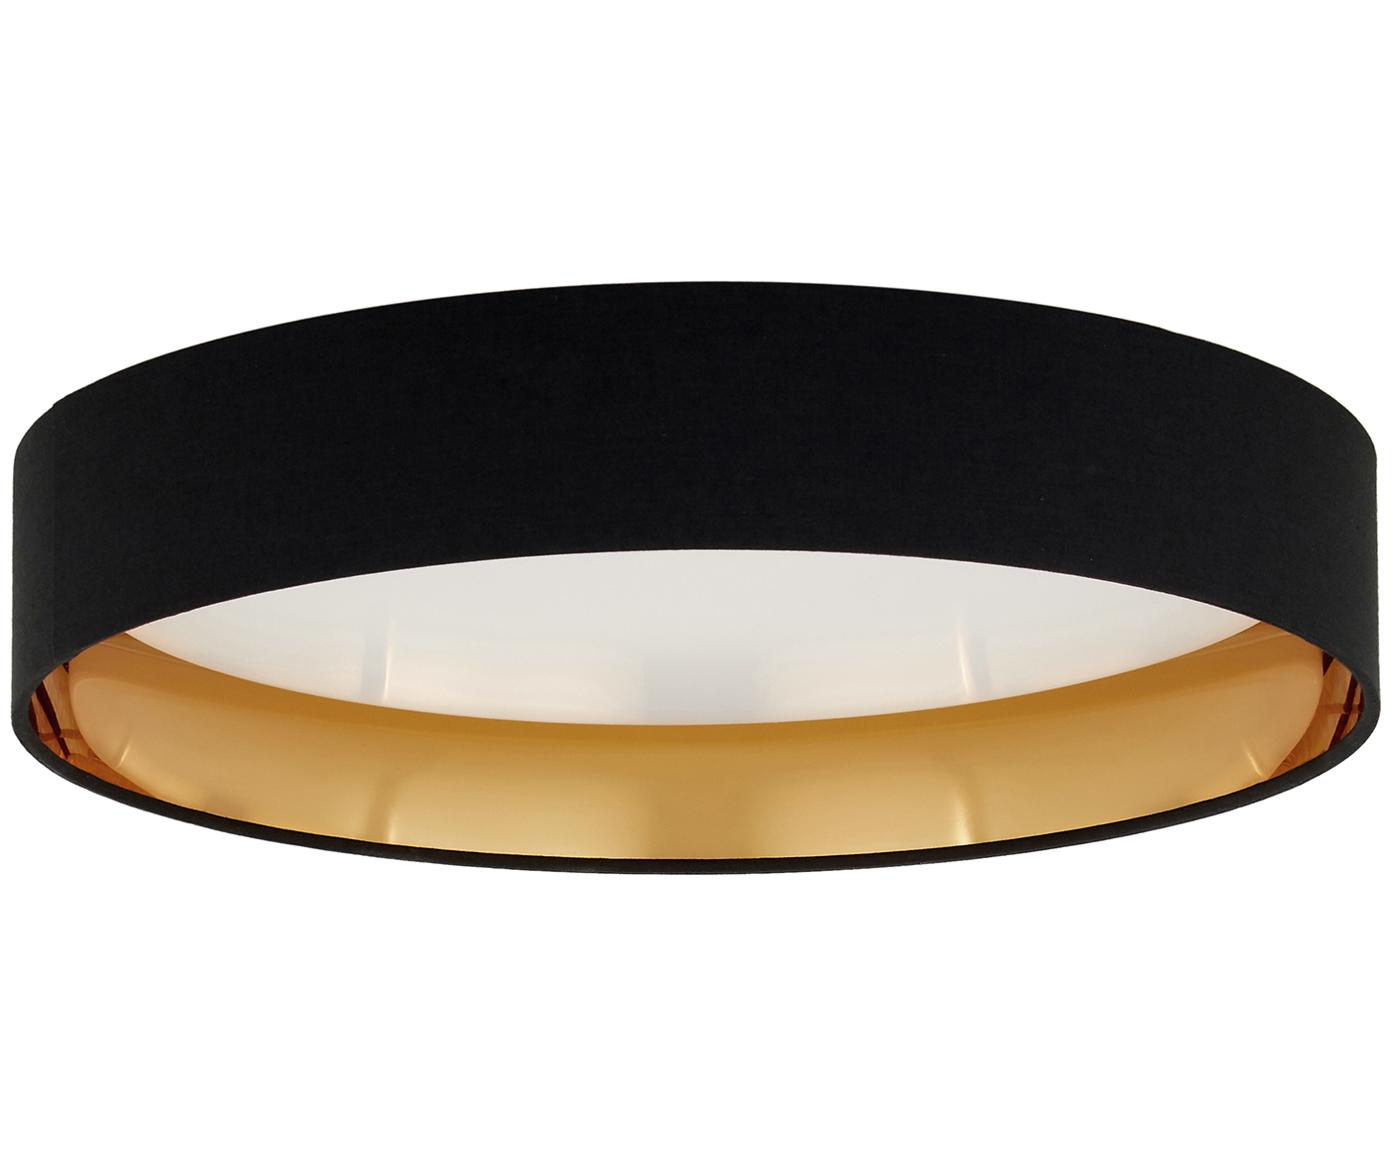 Plafón LED Mallory, Negro, Ø 41 x Al 10 cm